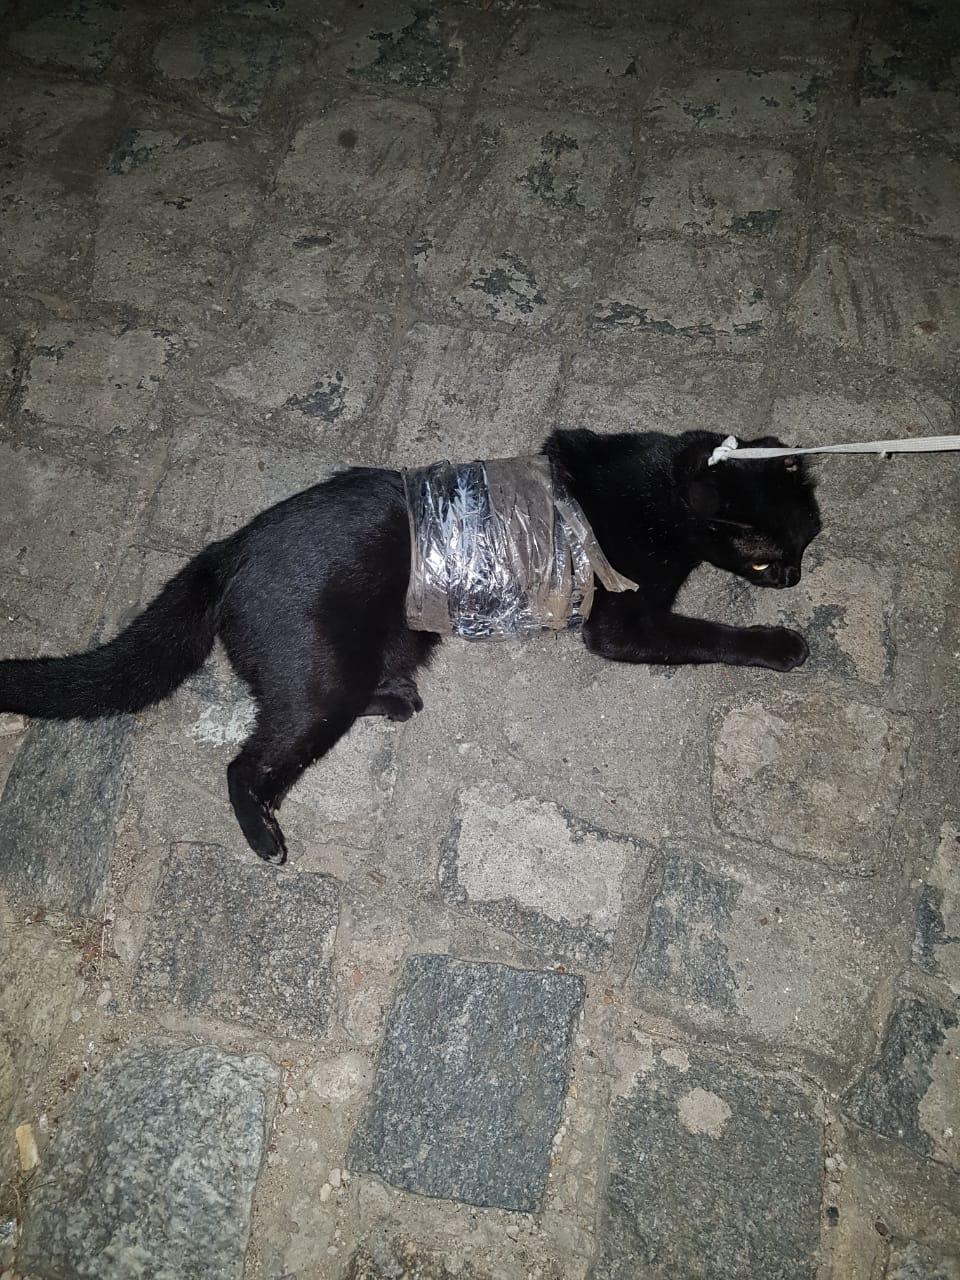 WhatsApp-Image-2019-01-28-at-12.58.54-285x380 Gato é flagrado transportando drogas para presídio da PB